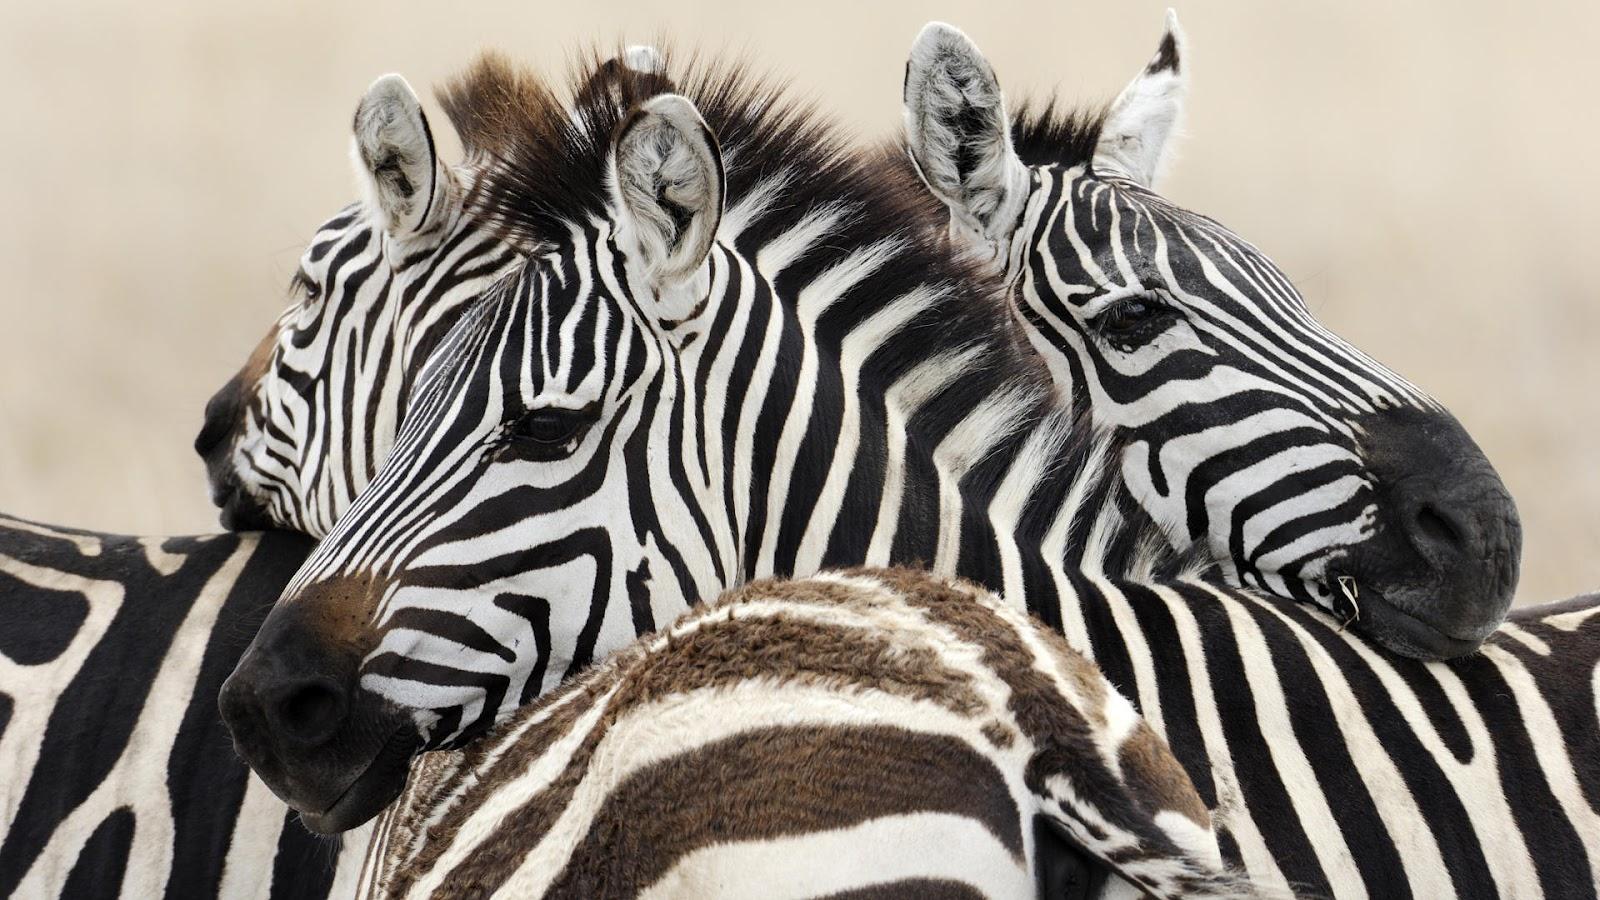 http://3.bp.blogspot.com/-_b1xKhm32q8/UClfZktjuTI/AAAAAAAAEtk/-wXOYE4Wjtk/s1600/hd-zebra-wallpaper-met-een-paar-zebras-achtergrond-foto.jpg